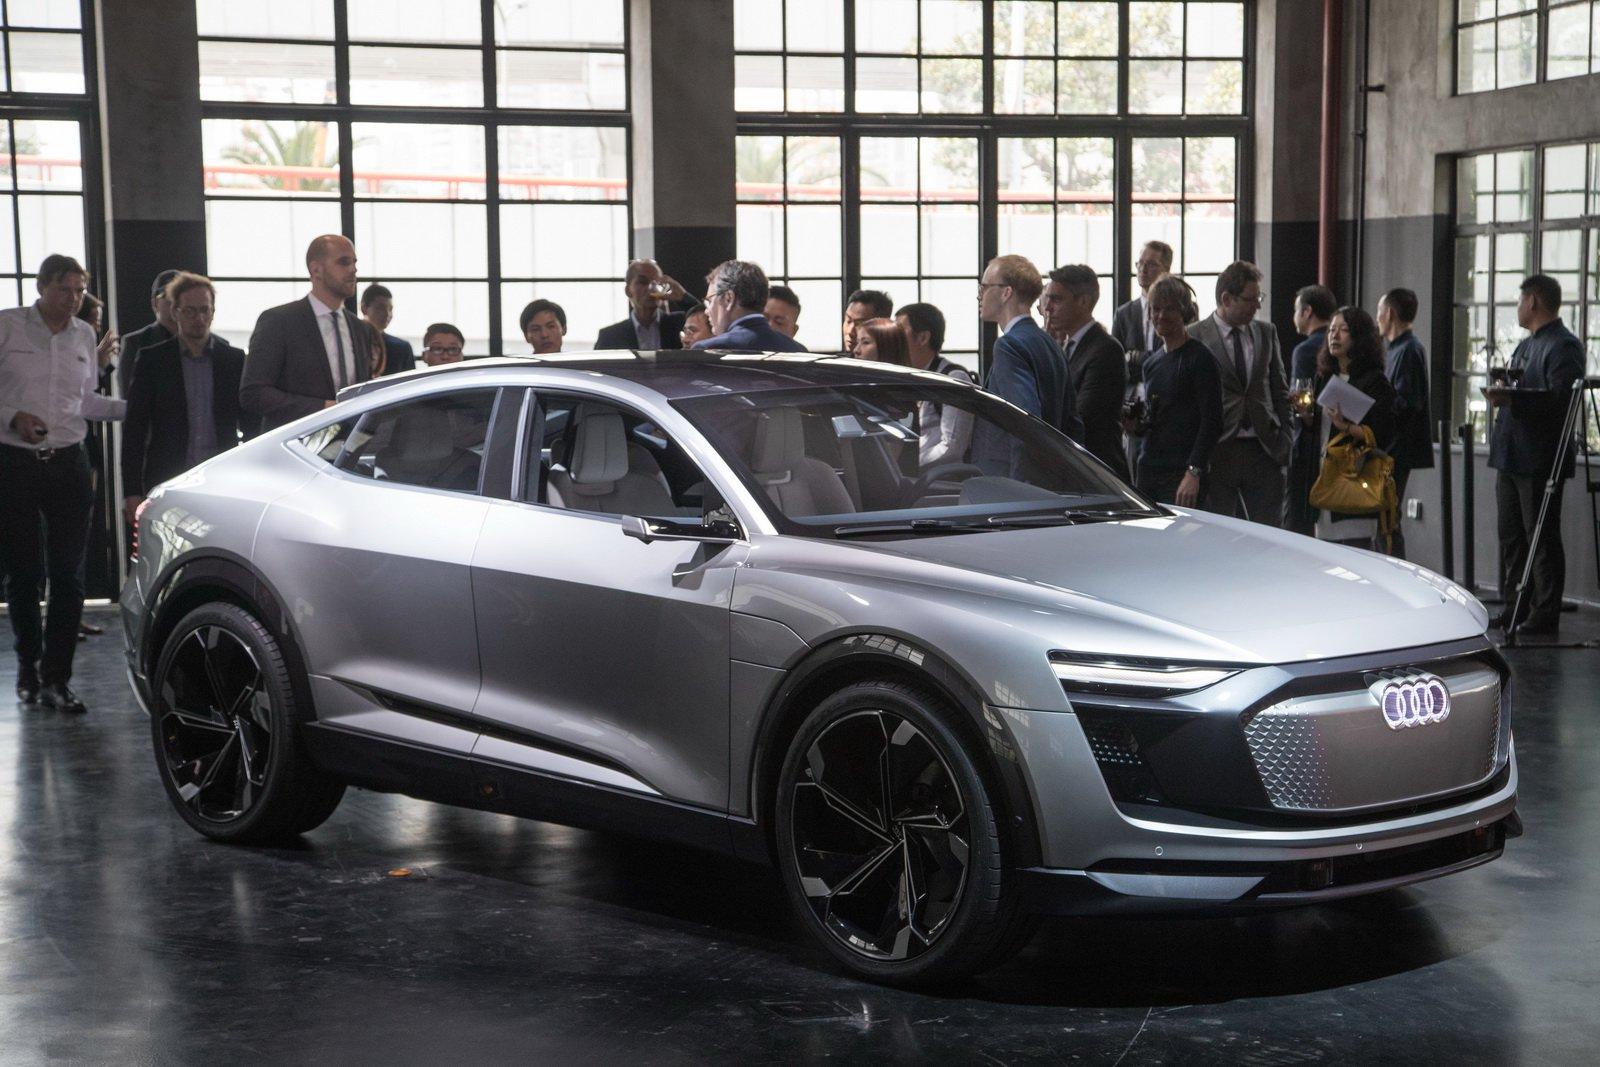 2017-audi-e-tron-sportback-concept-1.jpg